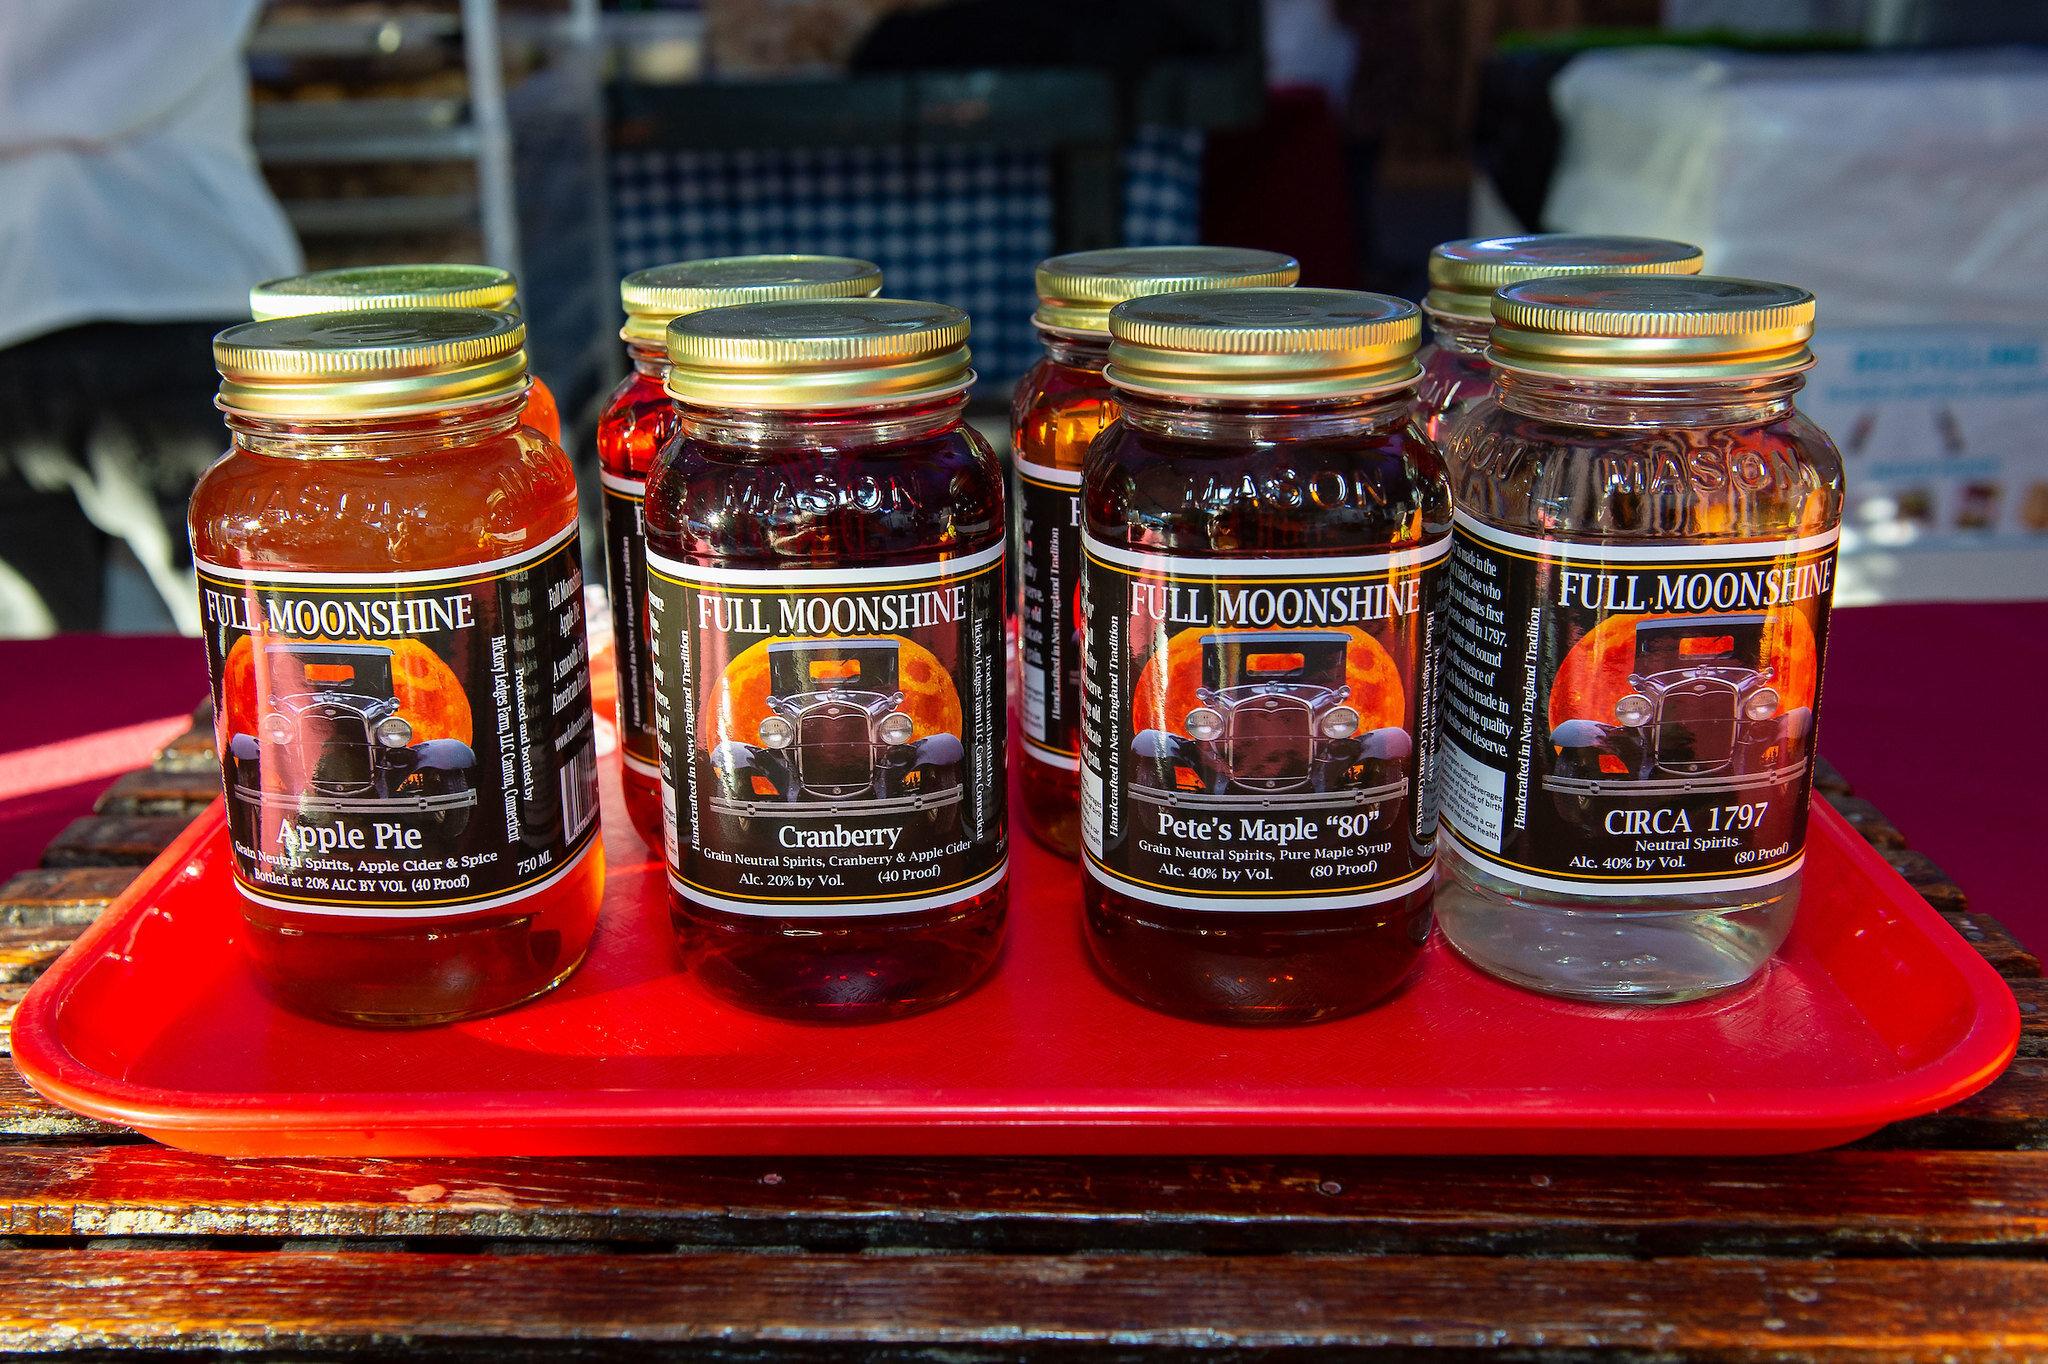 Hickory Ledges Farm - Full Moonshine